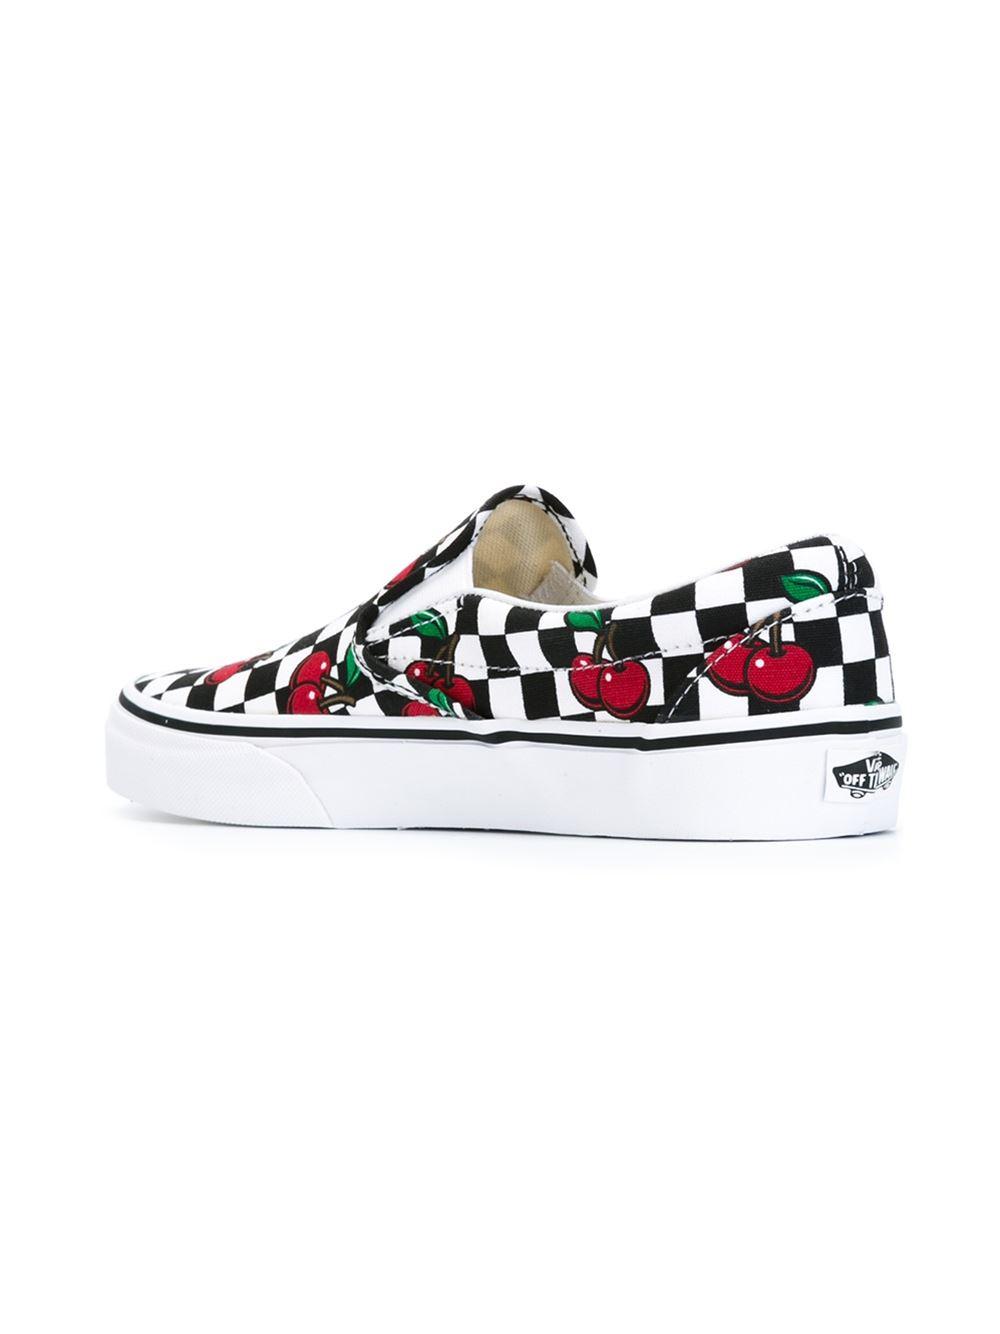 Cherry Print Shoes Uk